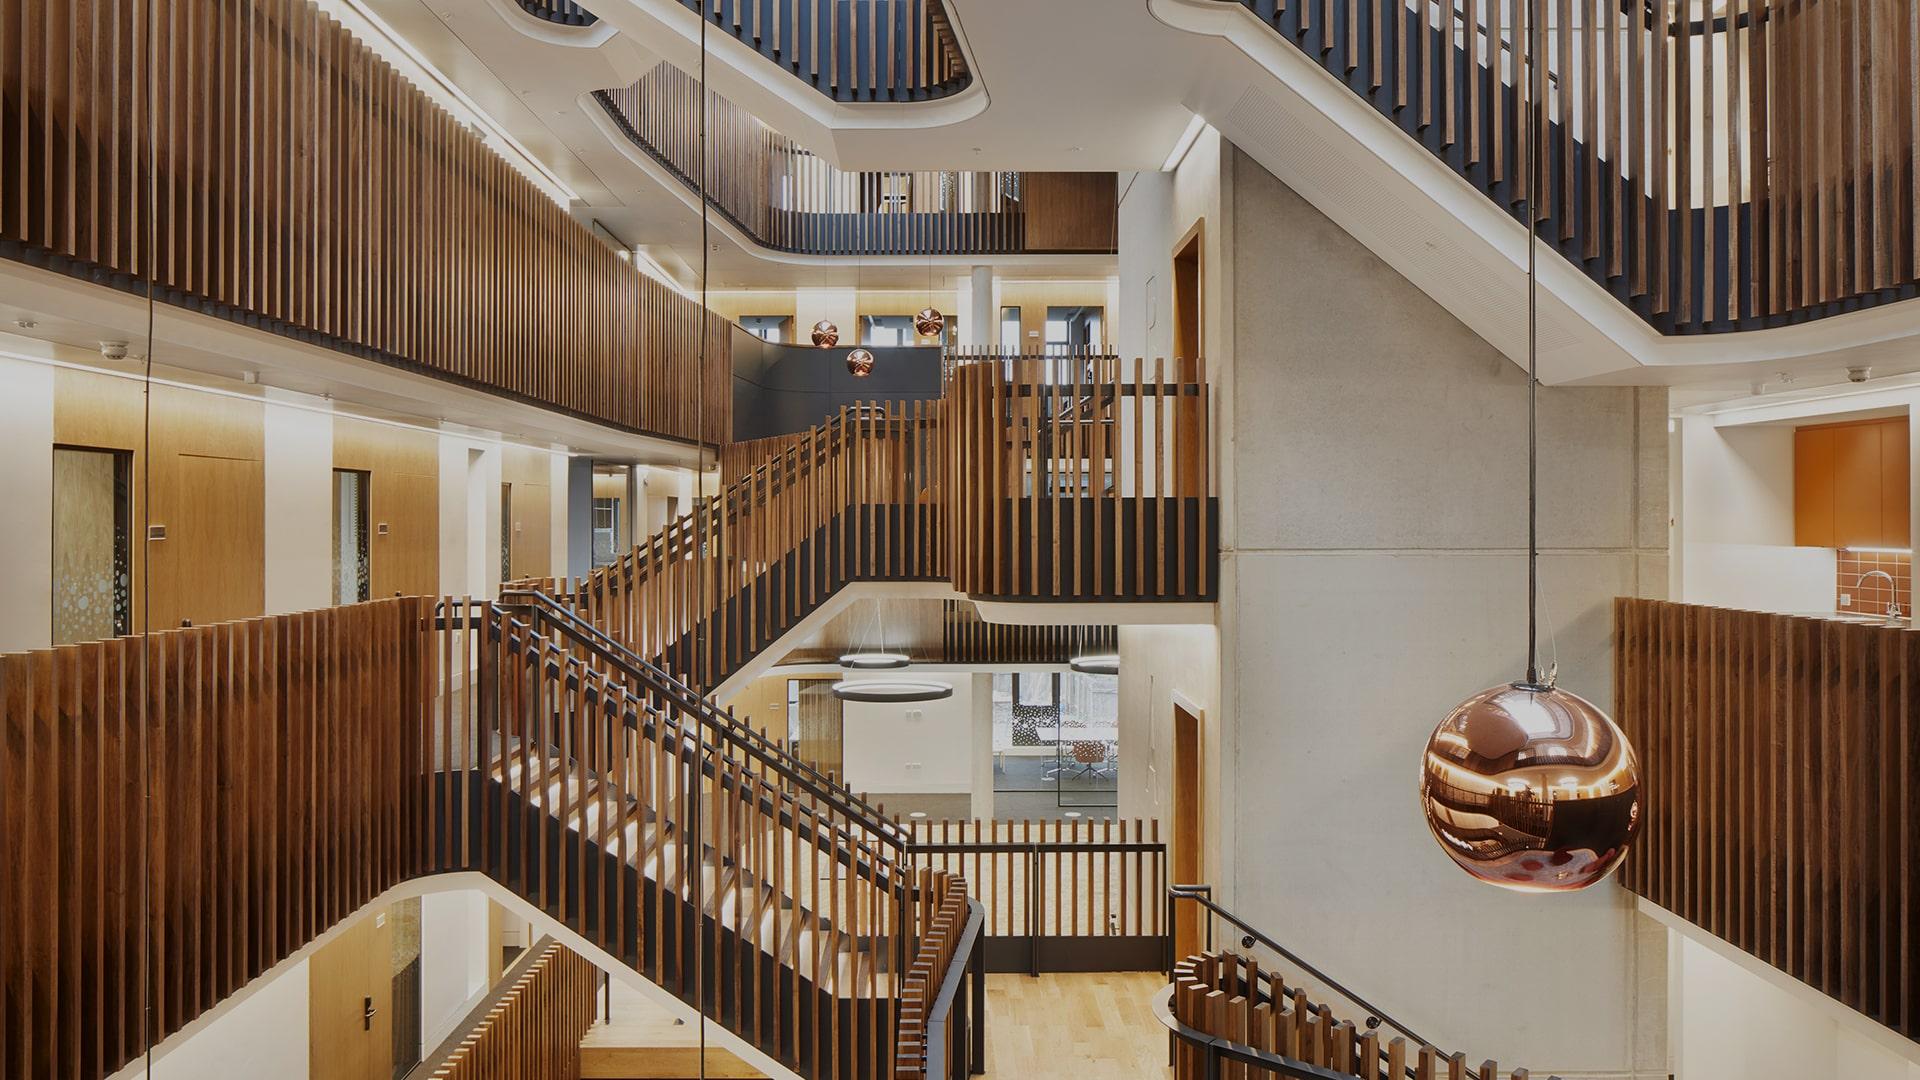 Beecroft Building office spaces